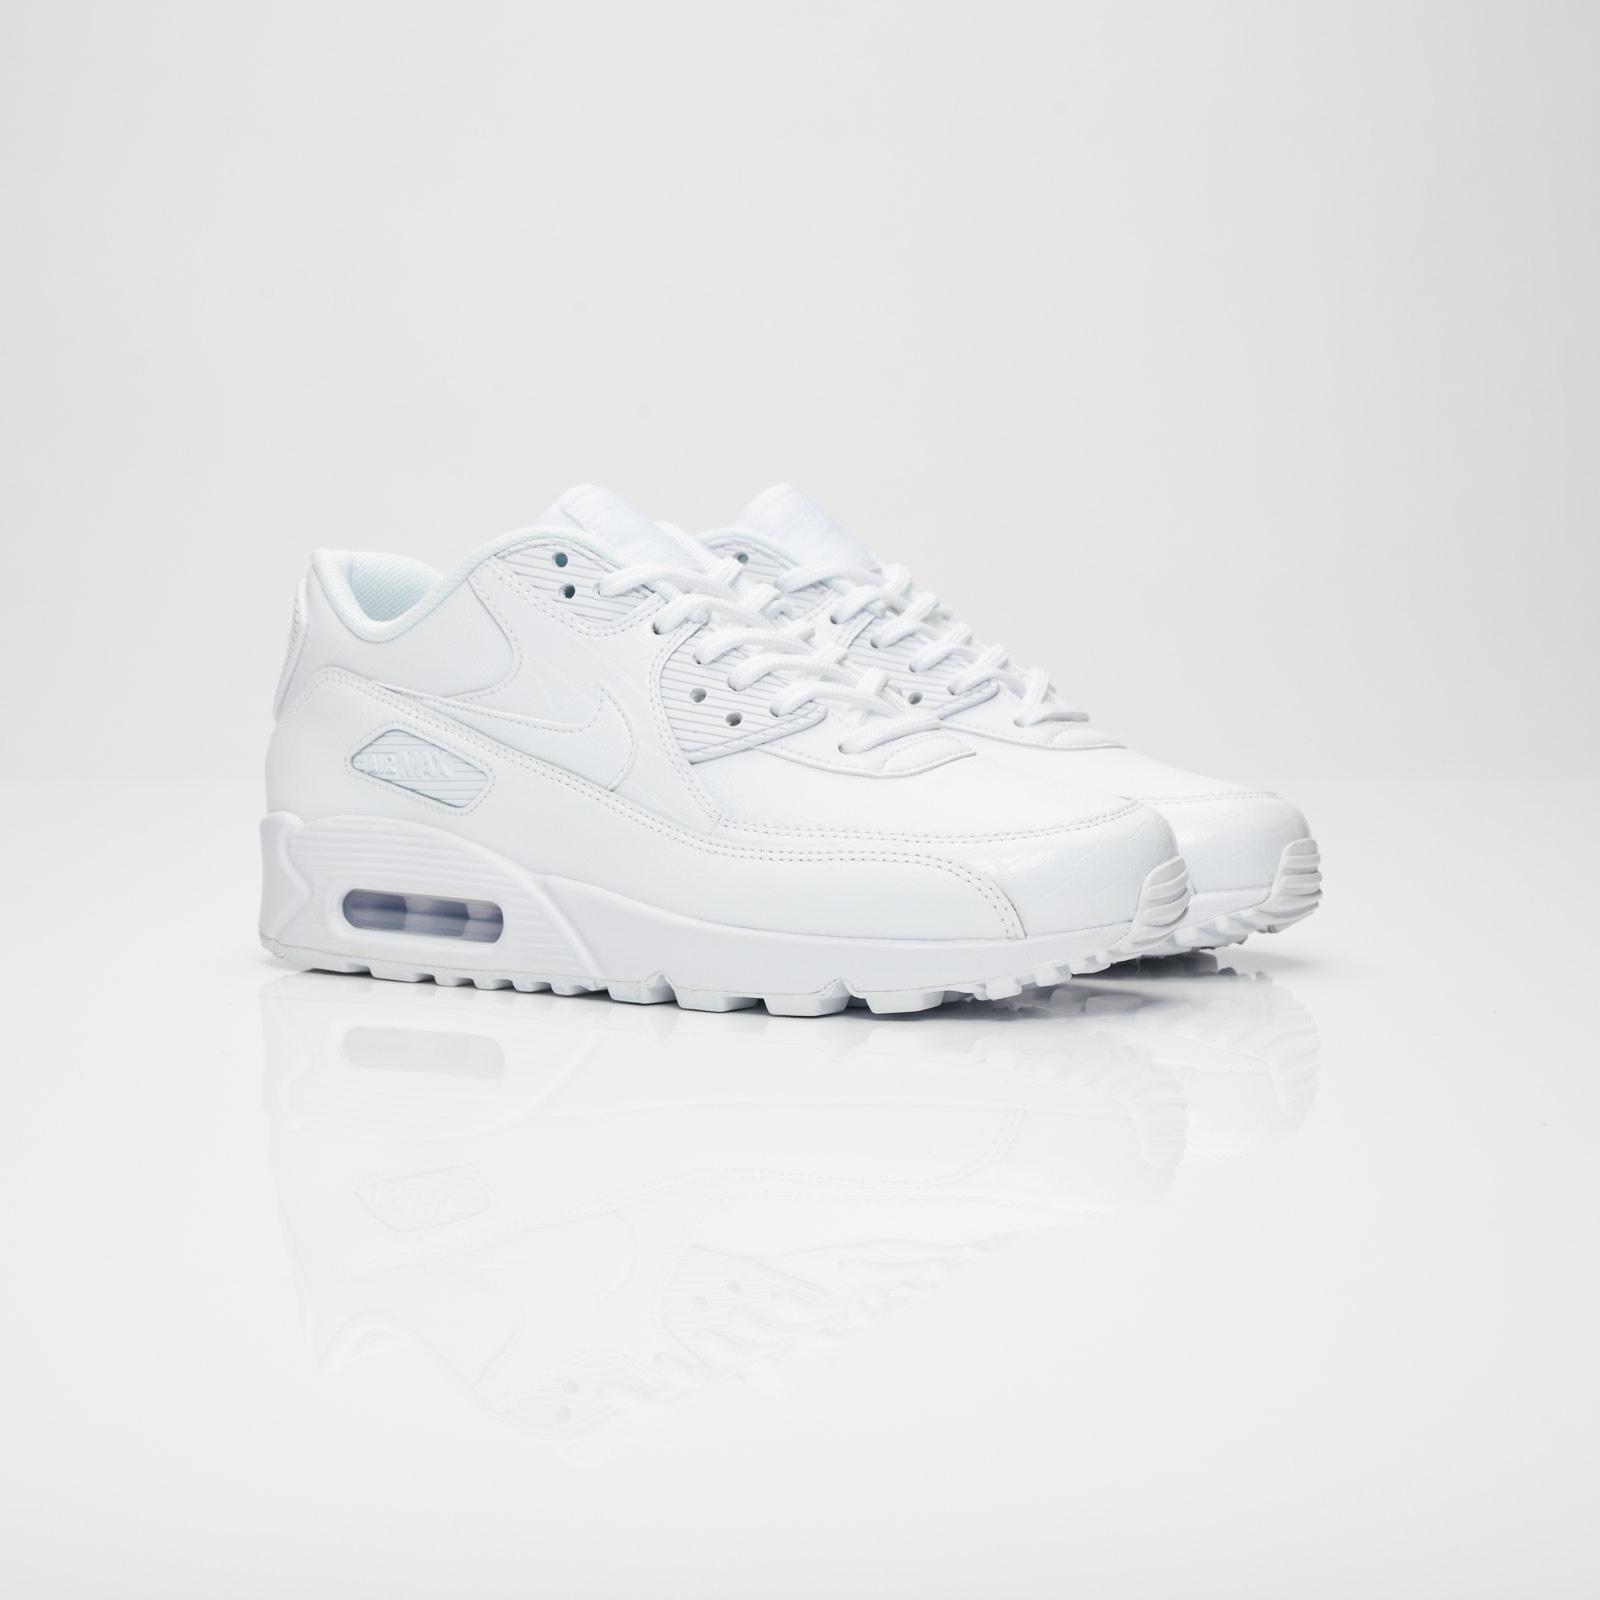 low priced 7e23d 9bbd7 Nike Sportswear Wmns Air Max 90